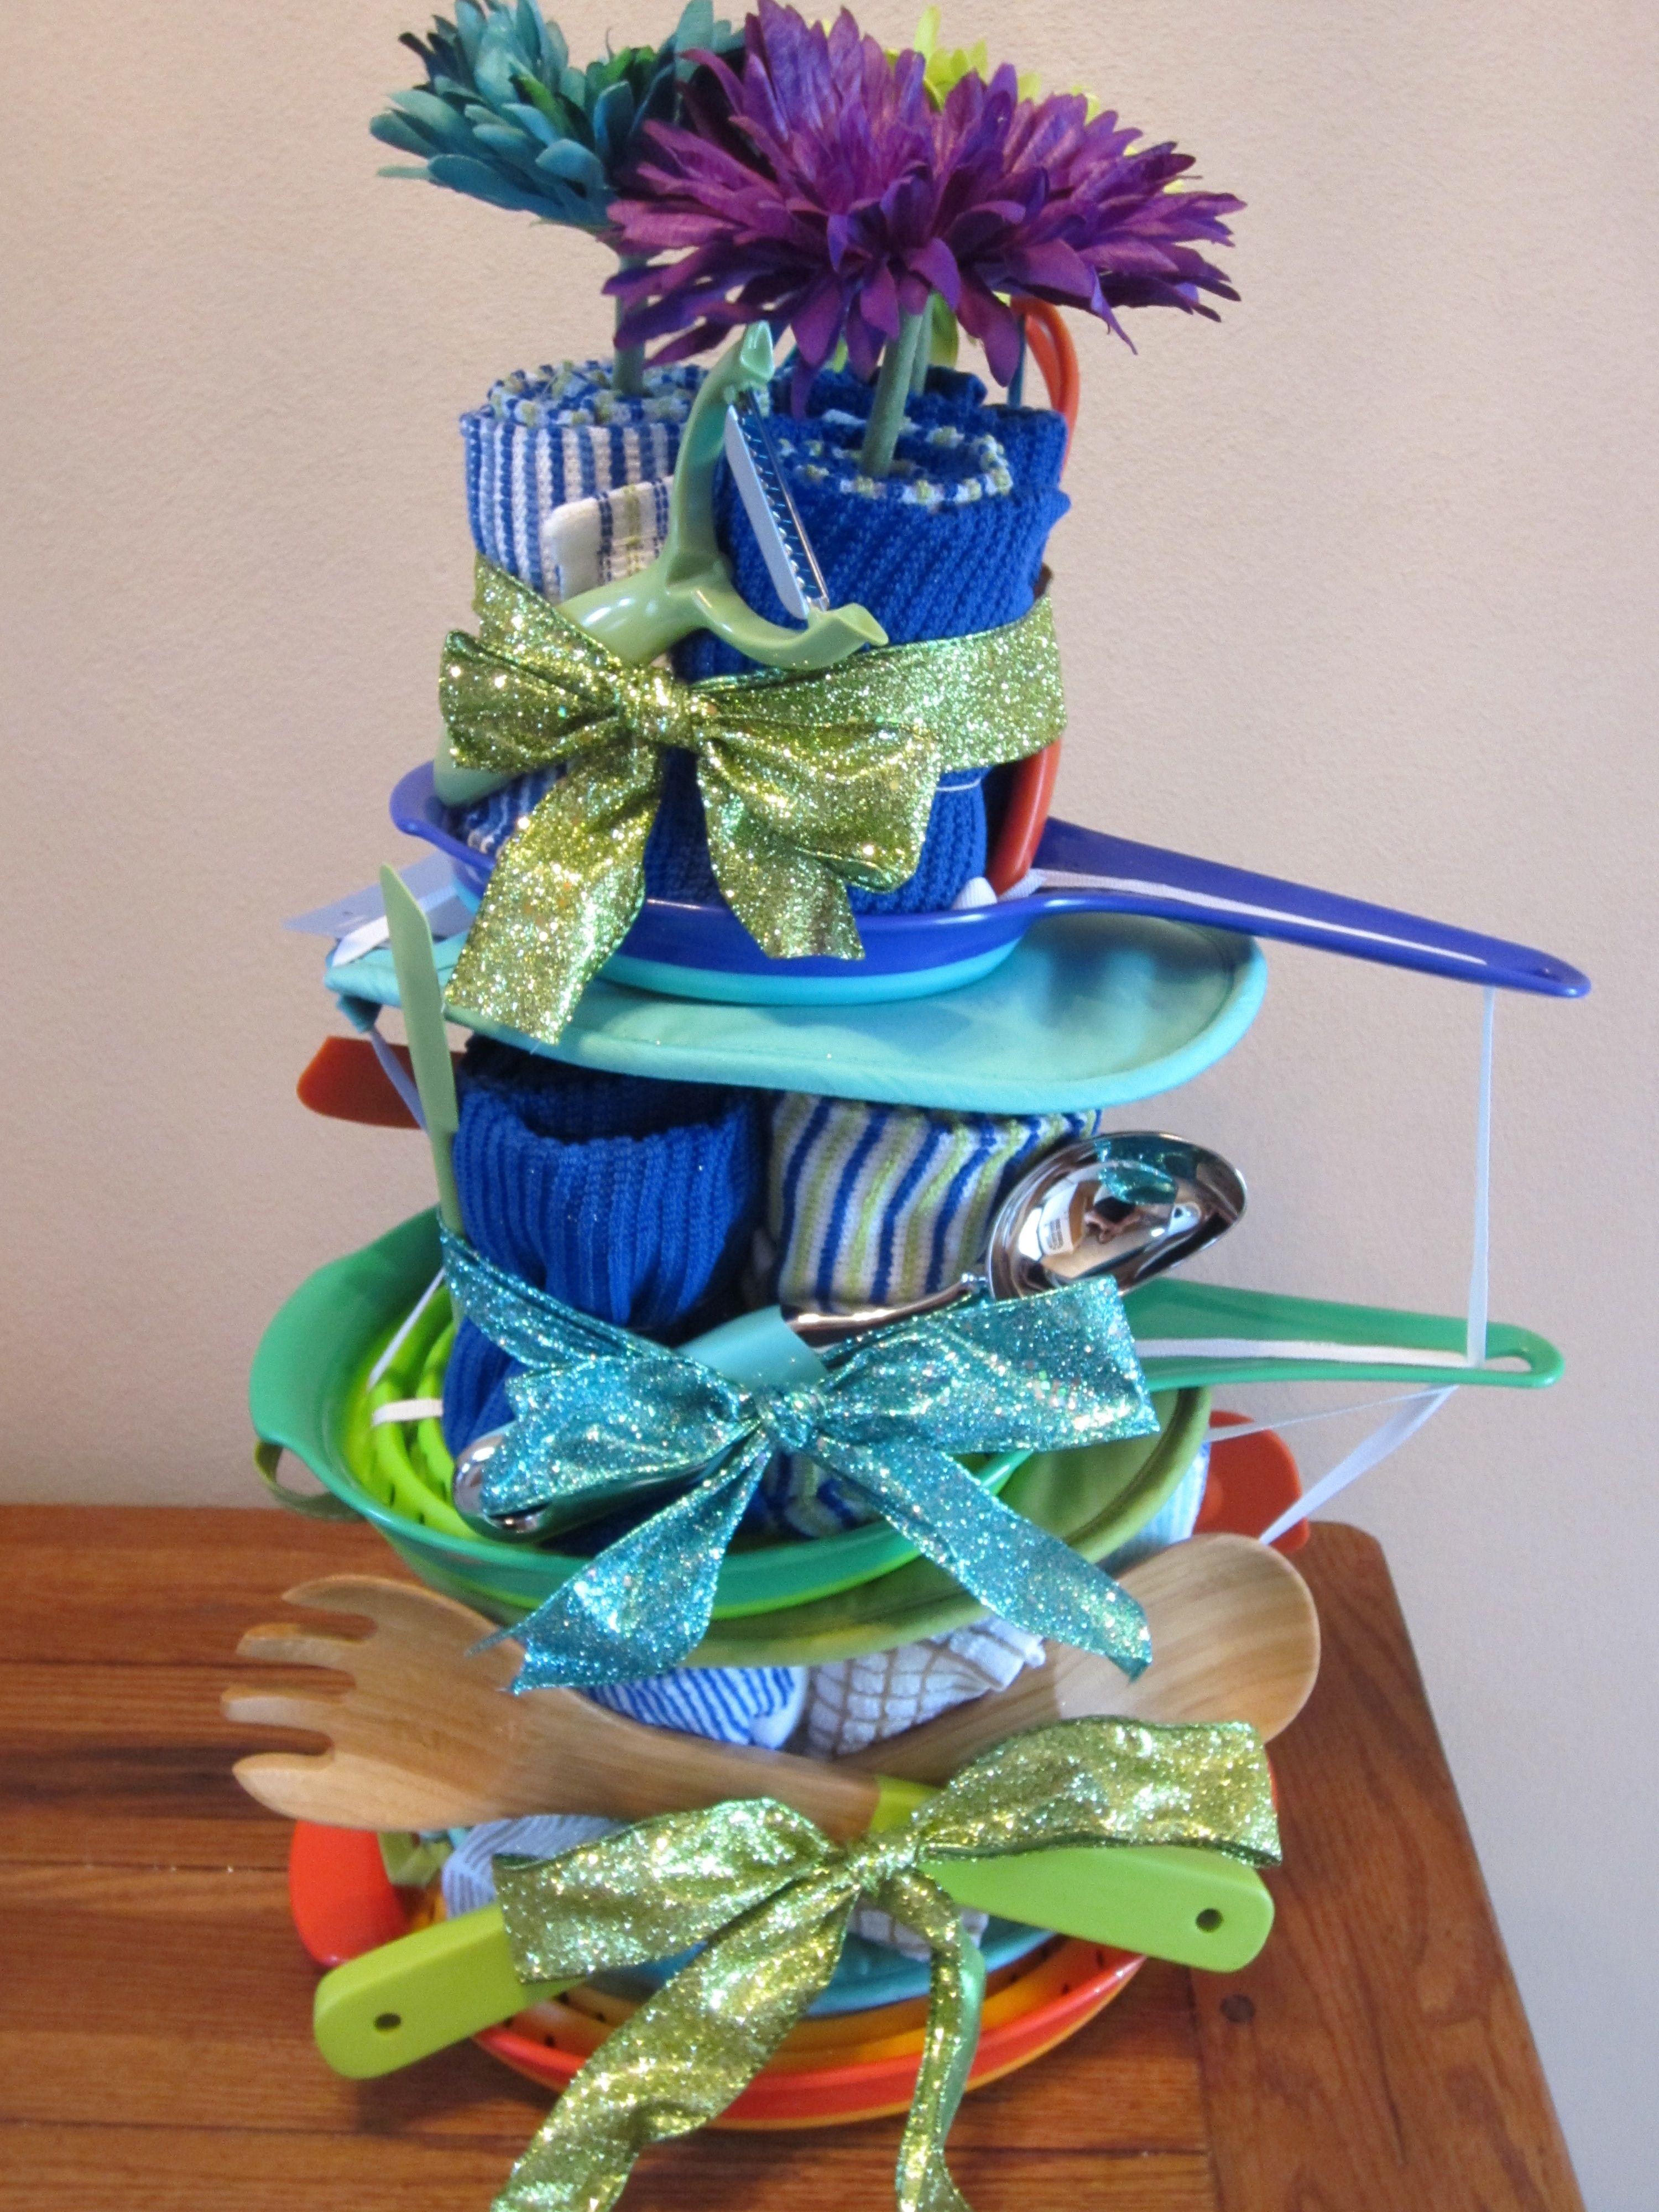 towel cake for kitchen shower | Clever Ideas | Pinterest | Towel ...